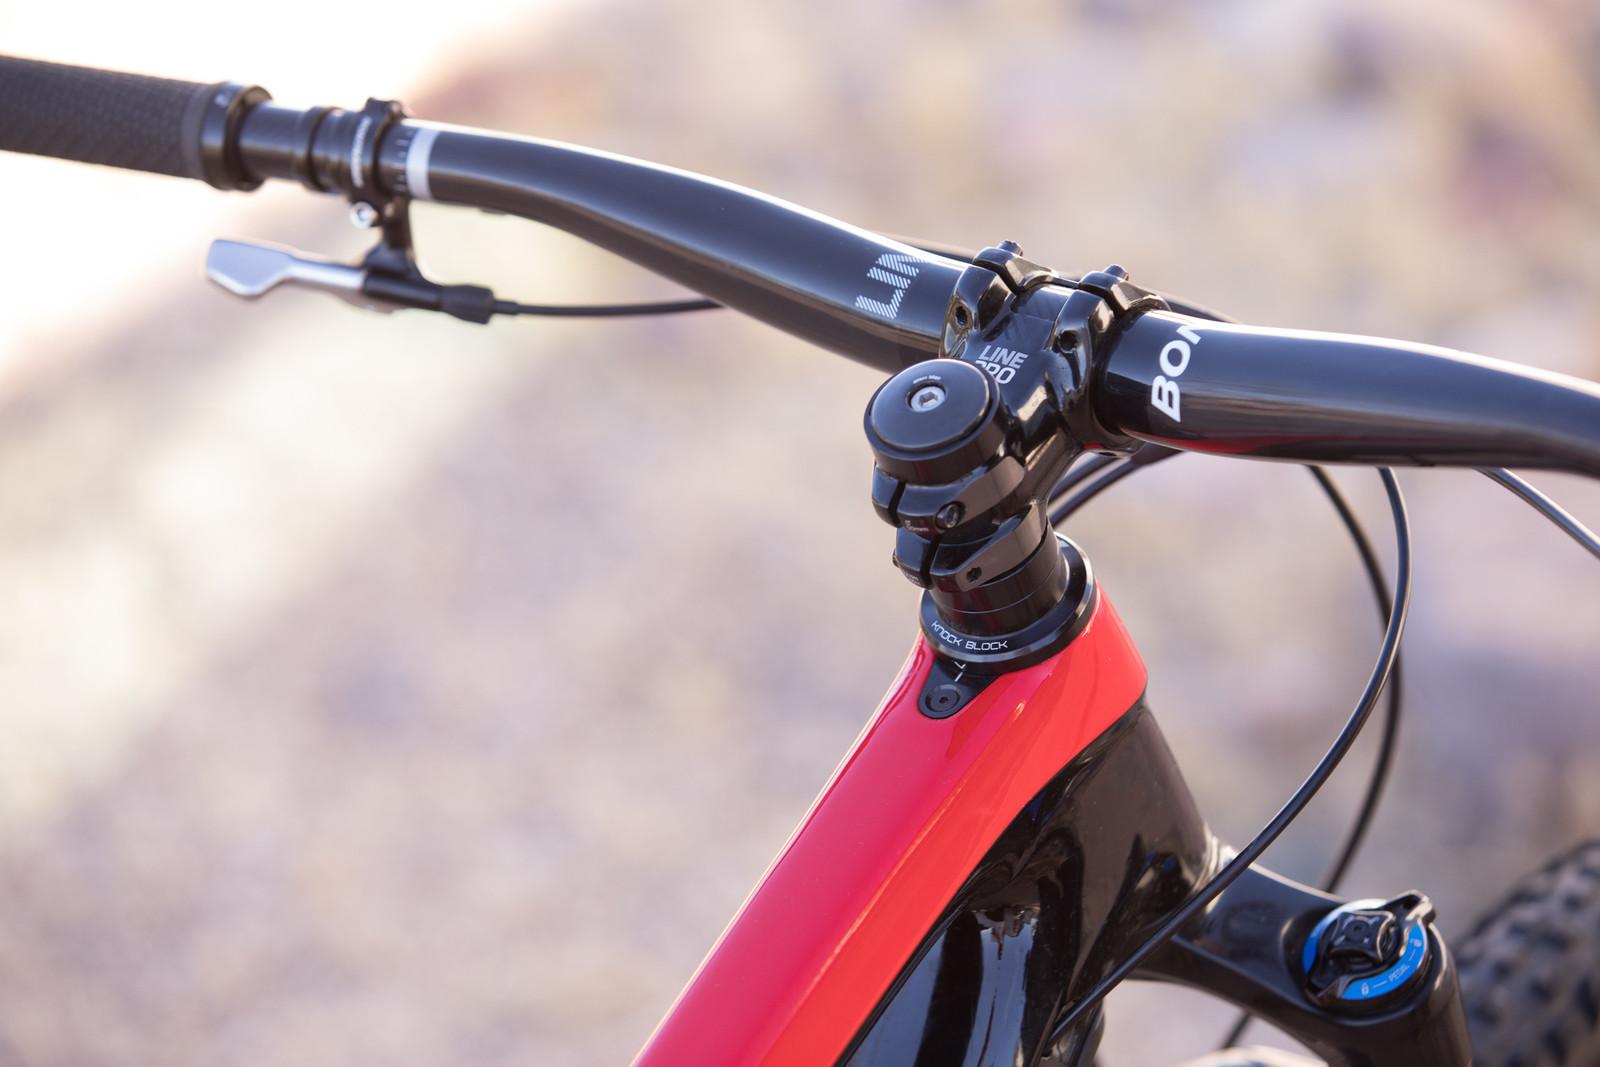 Trek Remedy 9.9 Race Shop Limited - 2017 Vital MTB Test Sessions - Trek Remedy 9.9 Race Shop Limited - 2017 Vital MTB Test Sessions - Mountain Biking Pictures - Vital MTB